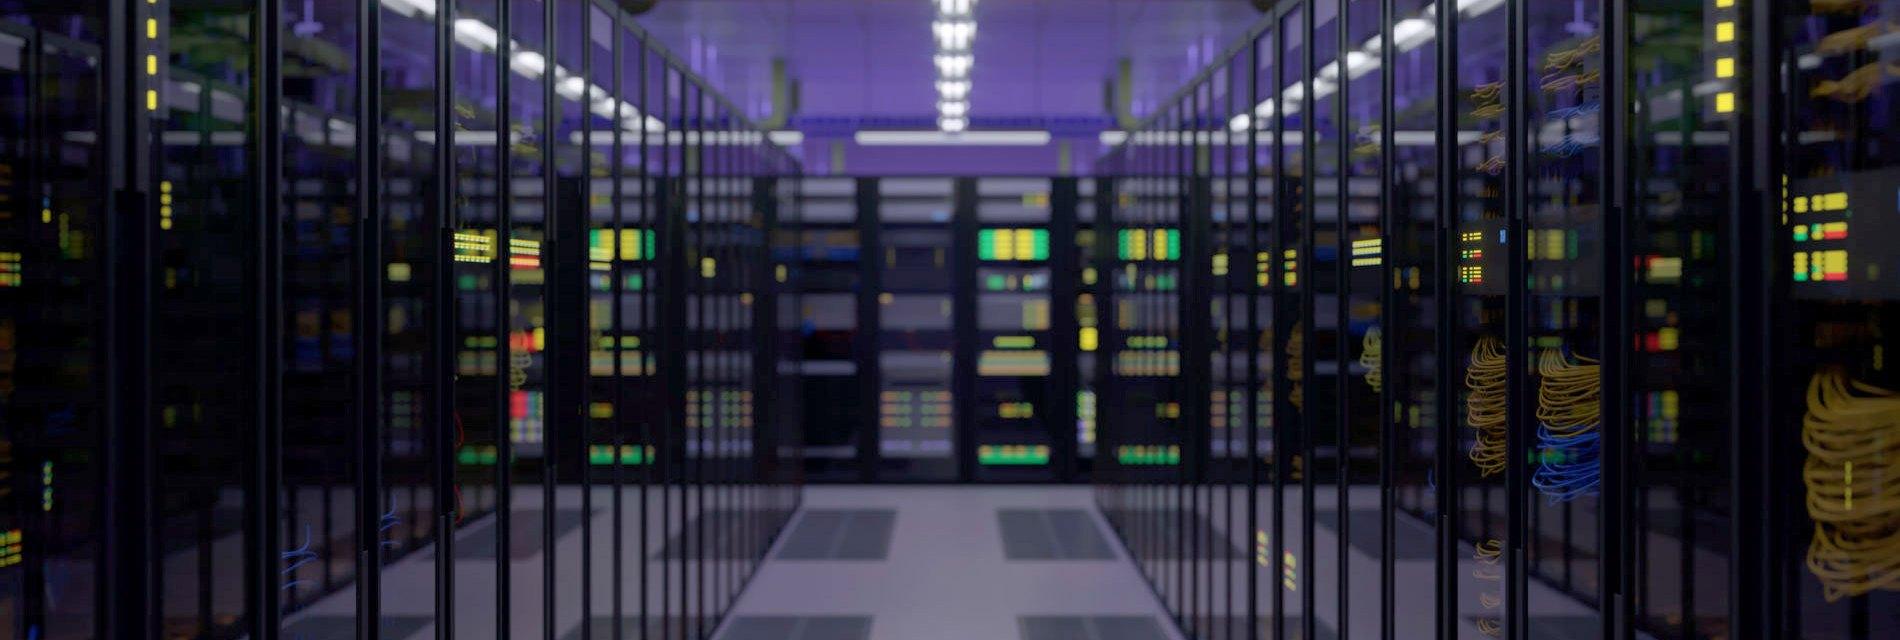 LIFARS - Digital Forensics and Incident Response Investigations Company